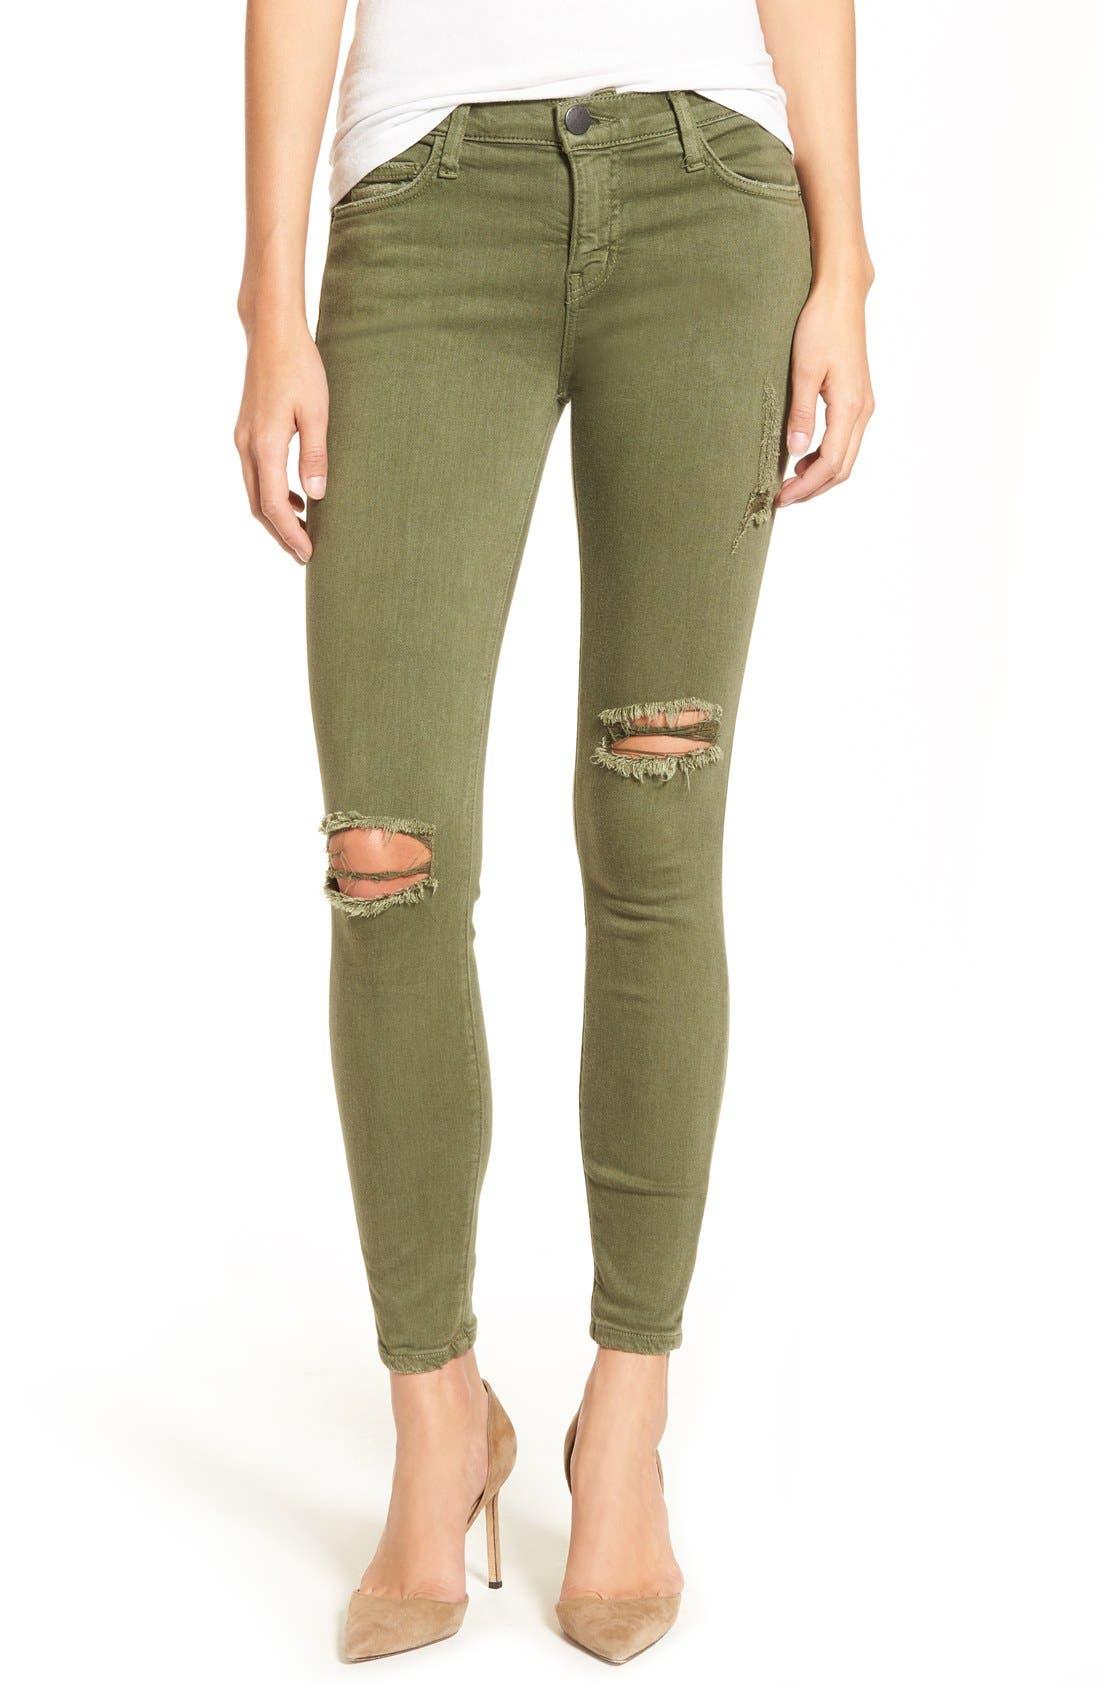 CURRENT/ELLIOTT, 'The Stiletto' Crop Skinny Jeans, Alternate thumbnail 3, color, 309